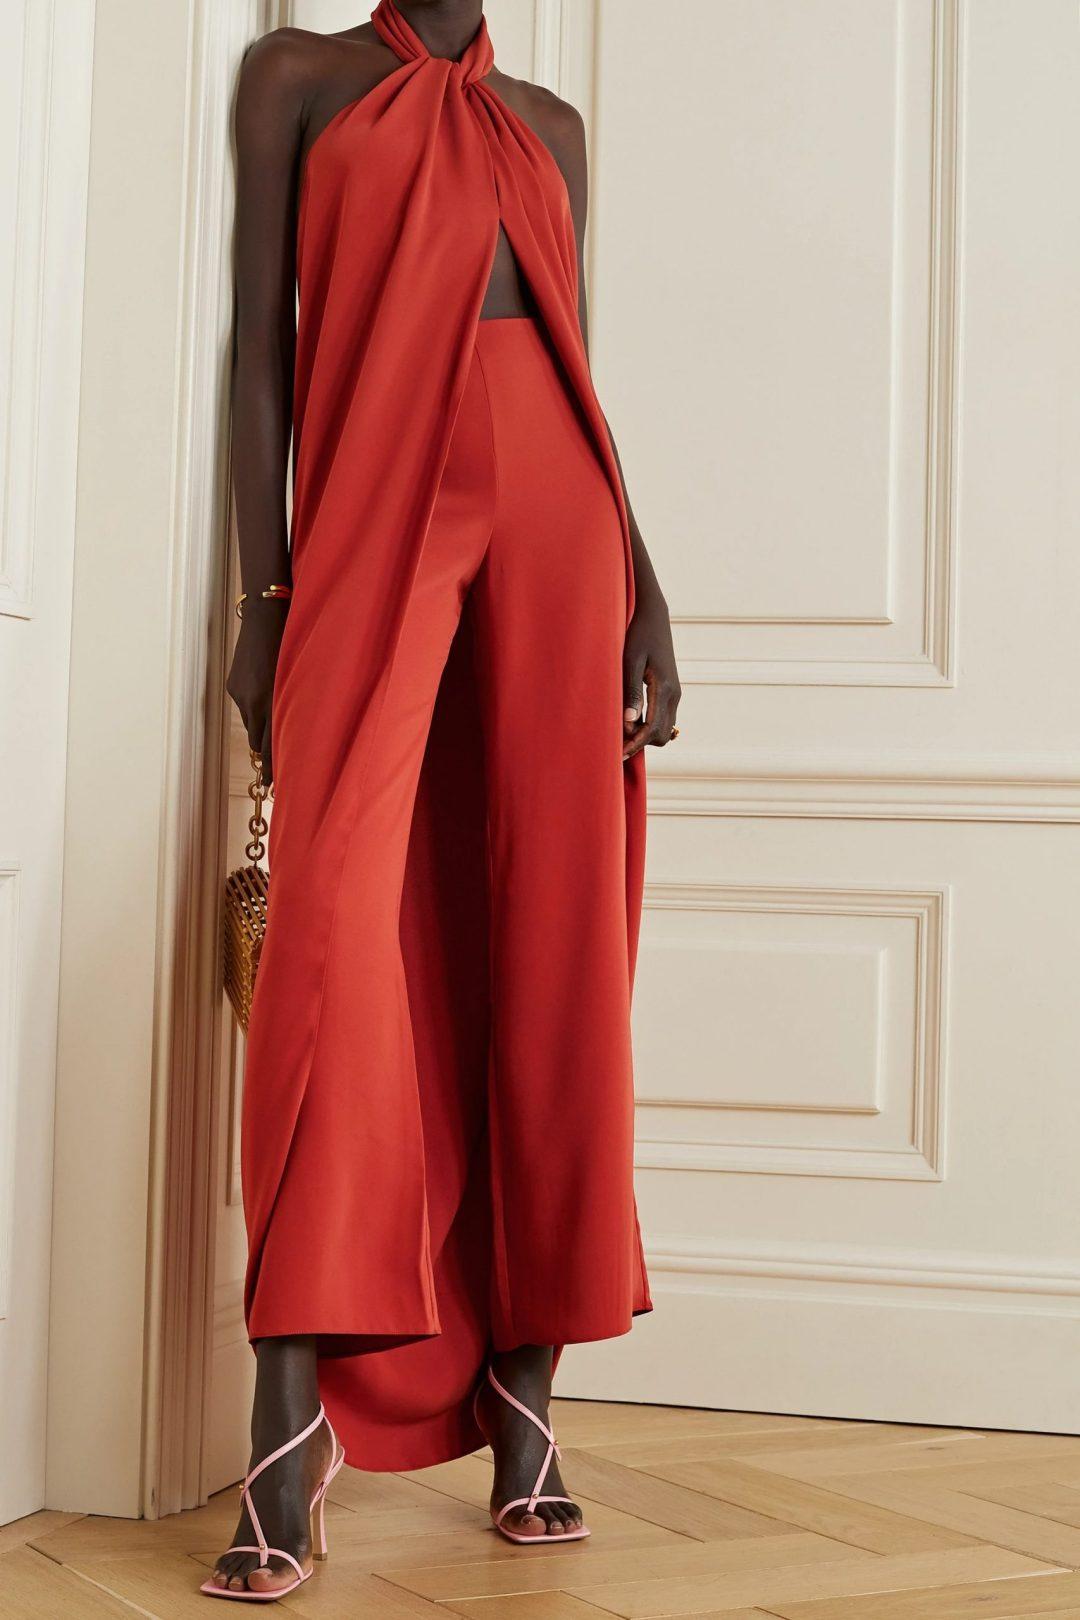 Blood orange halter designer jumpsuit